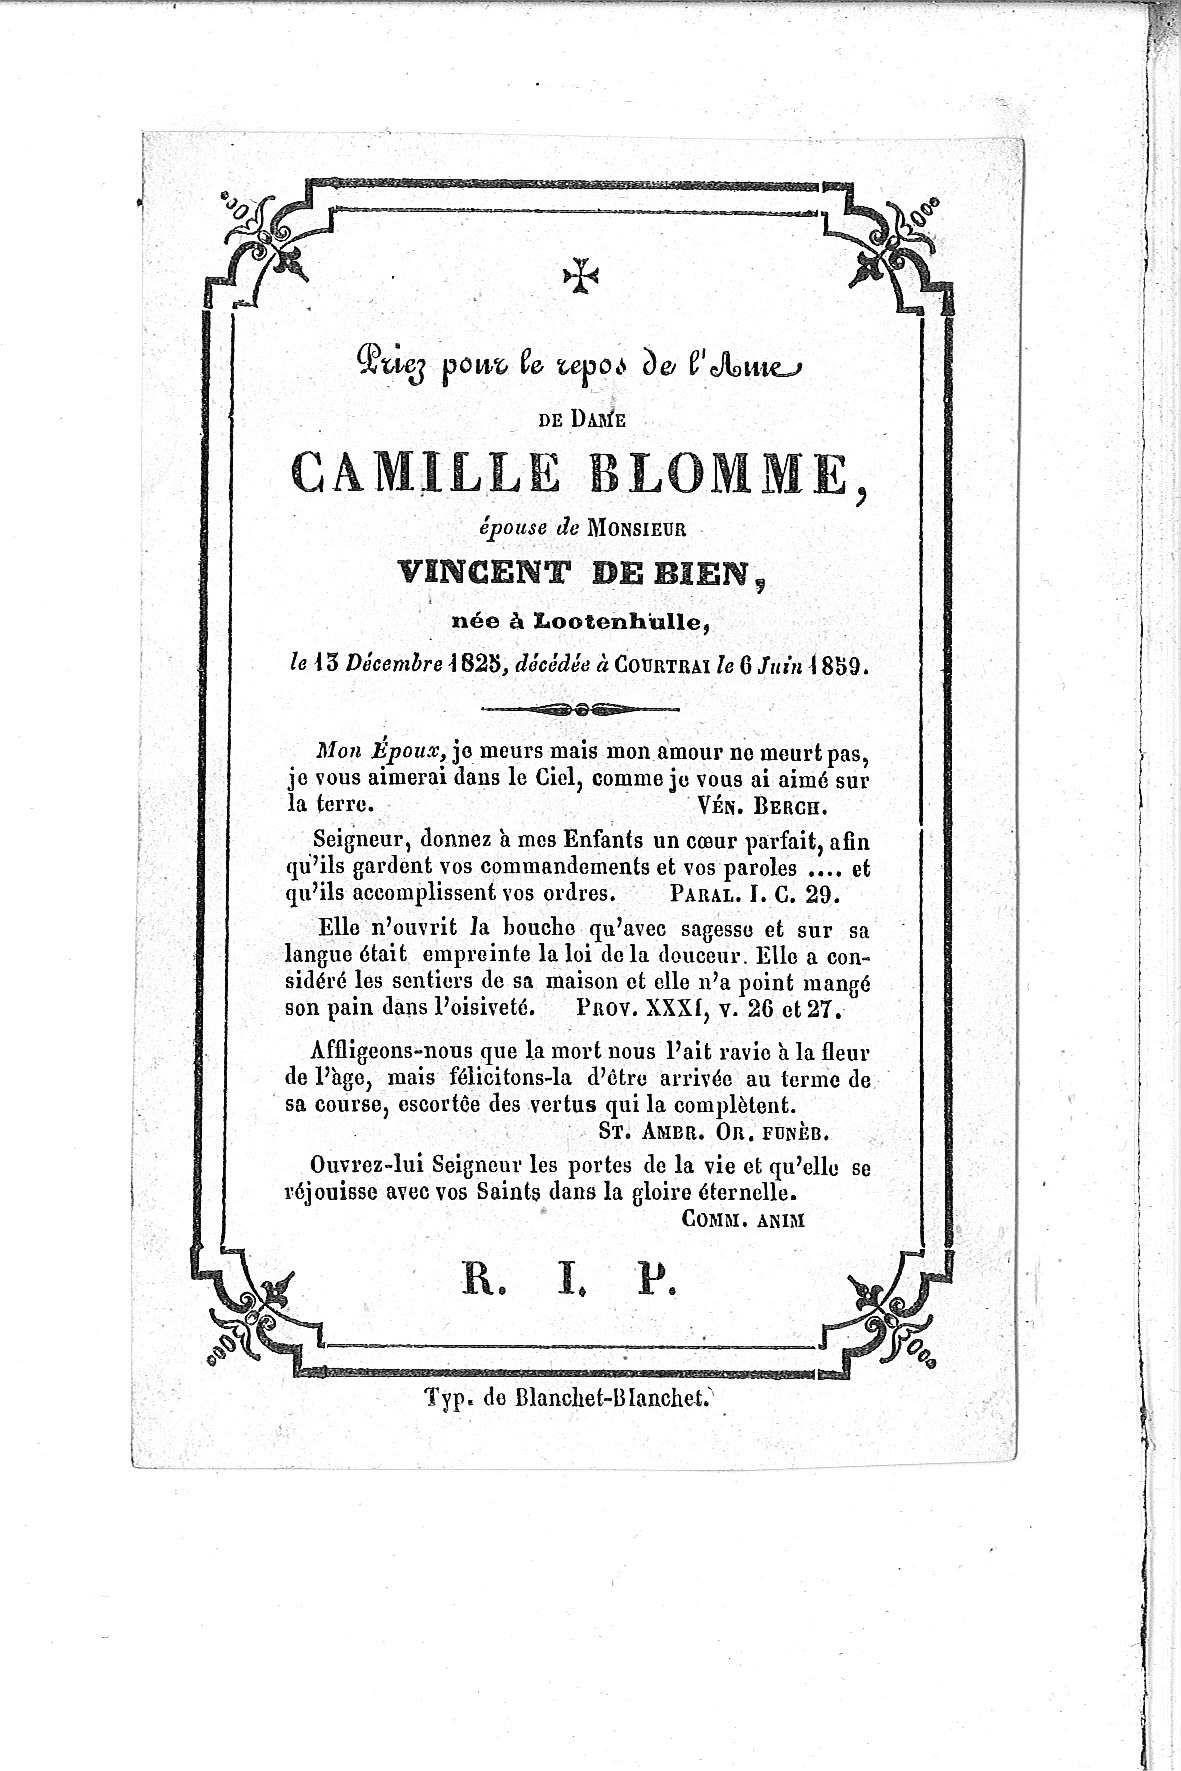 Camille(1859)20110308090225_00035.jpg